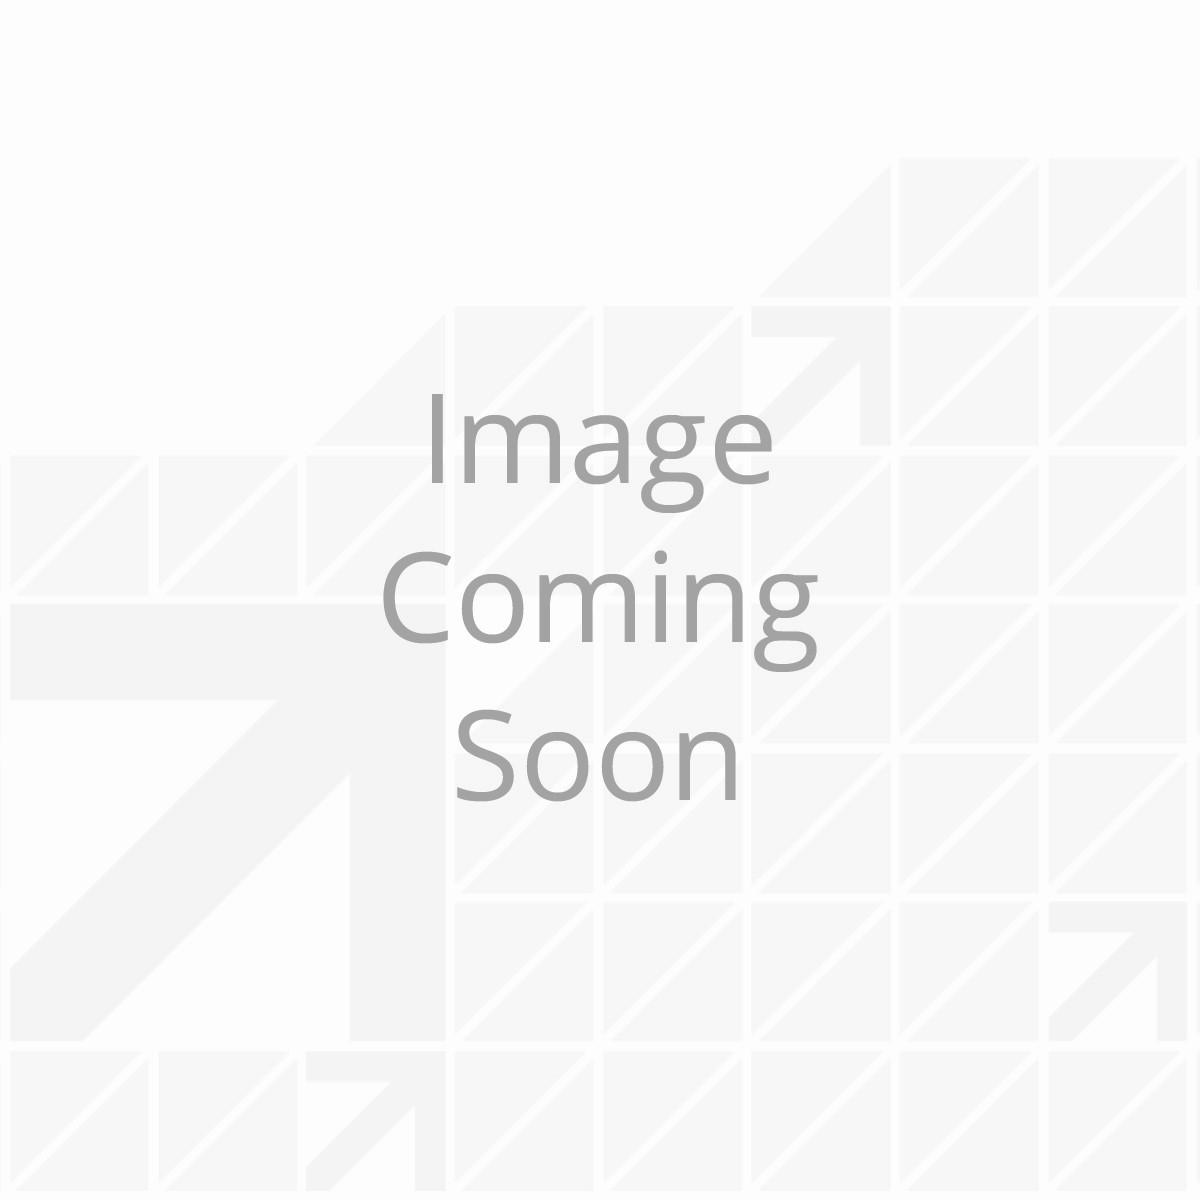 Antigua Women's Ice Fleece Pullover - Black and Steel